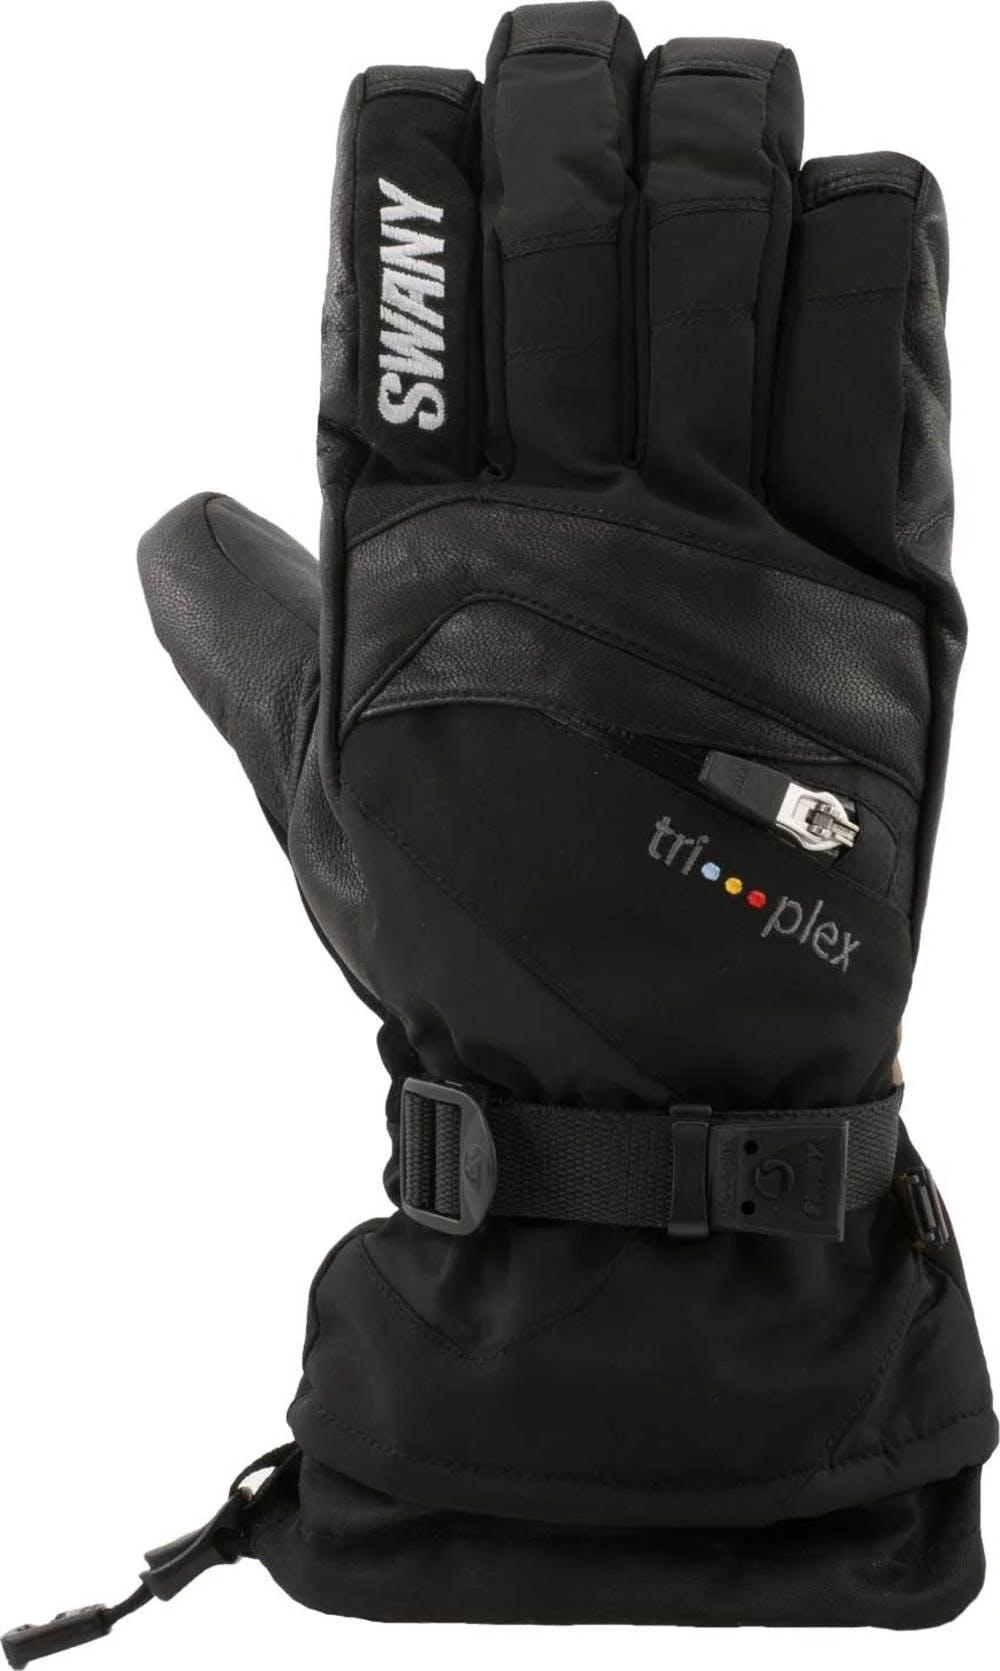 Swany Men's X Change Glove Black